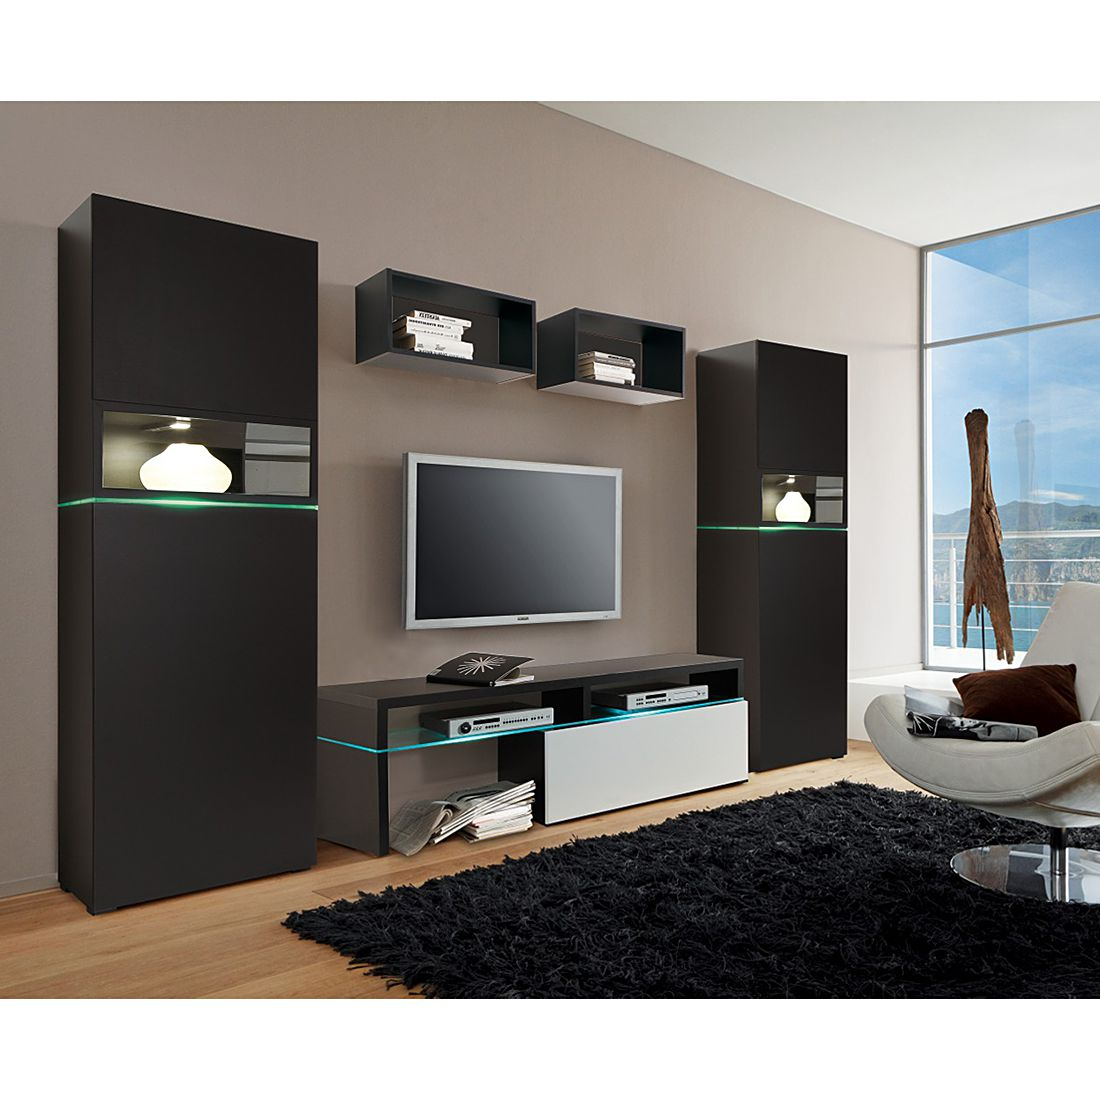 wohnwand colourart 5 teilig schwarz wei mit led. Black Bedroom Furniture Sets. Home Design Ideas